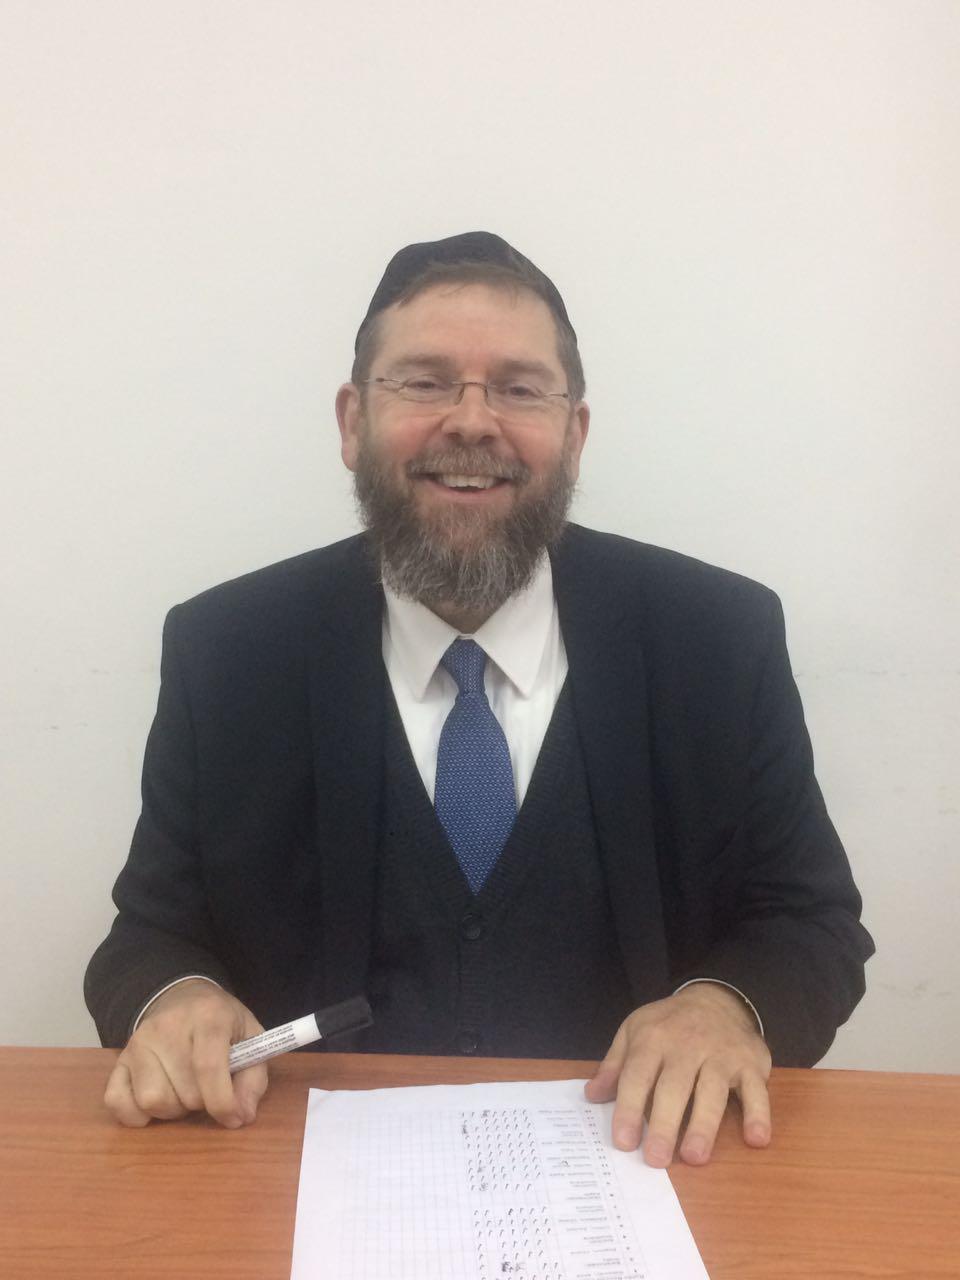 Rabbi Reuven Lauffer